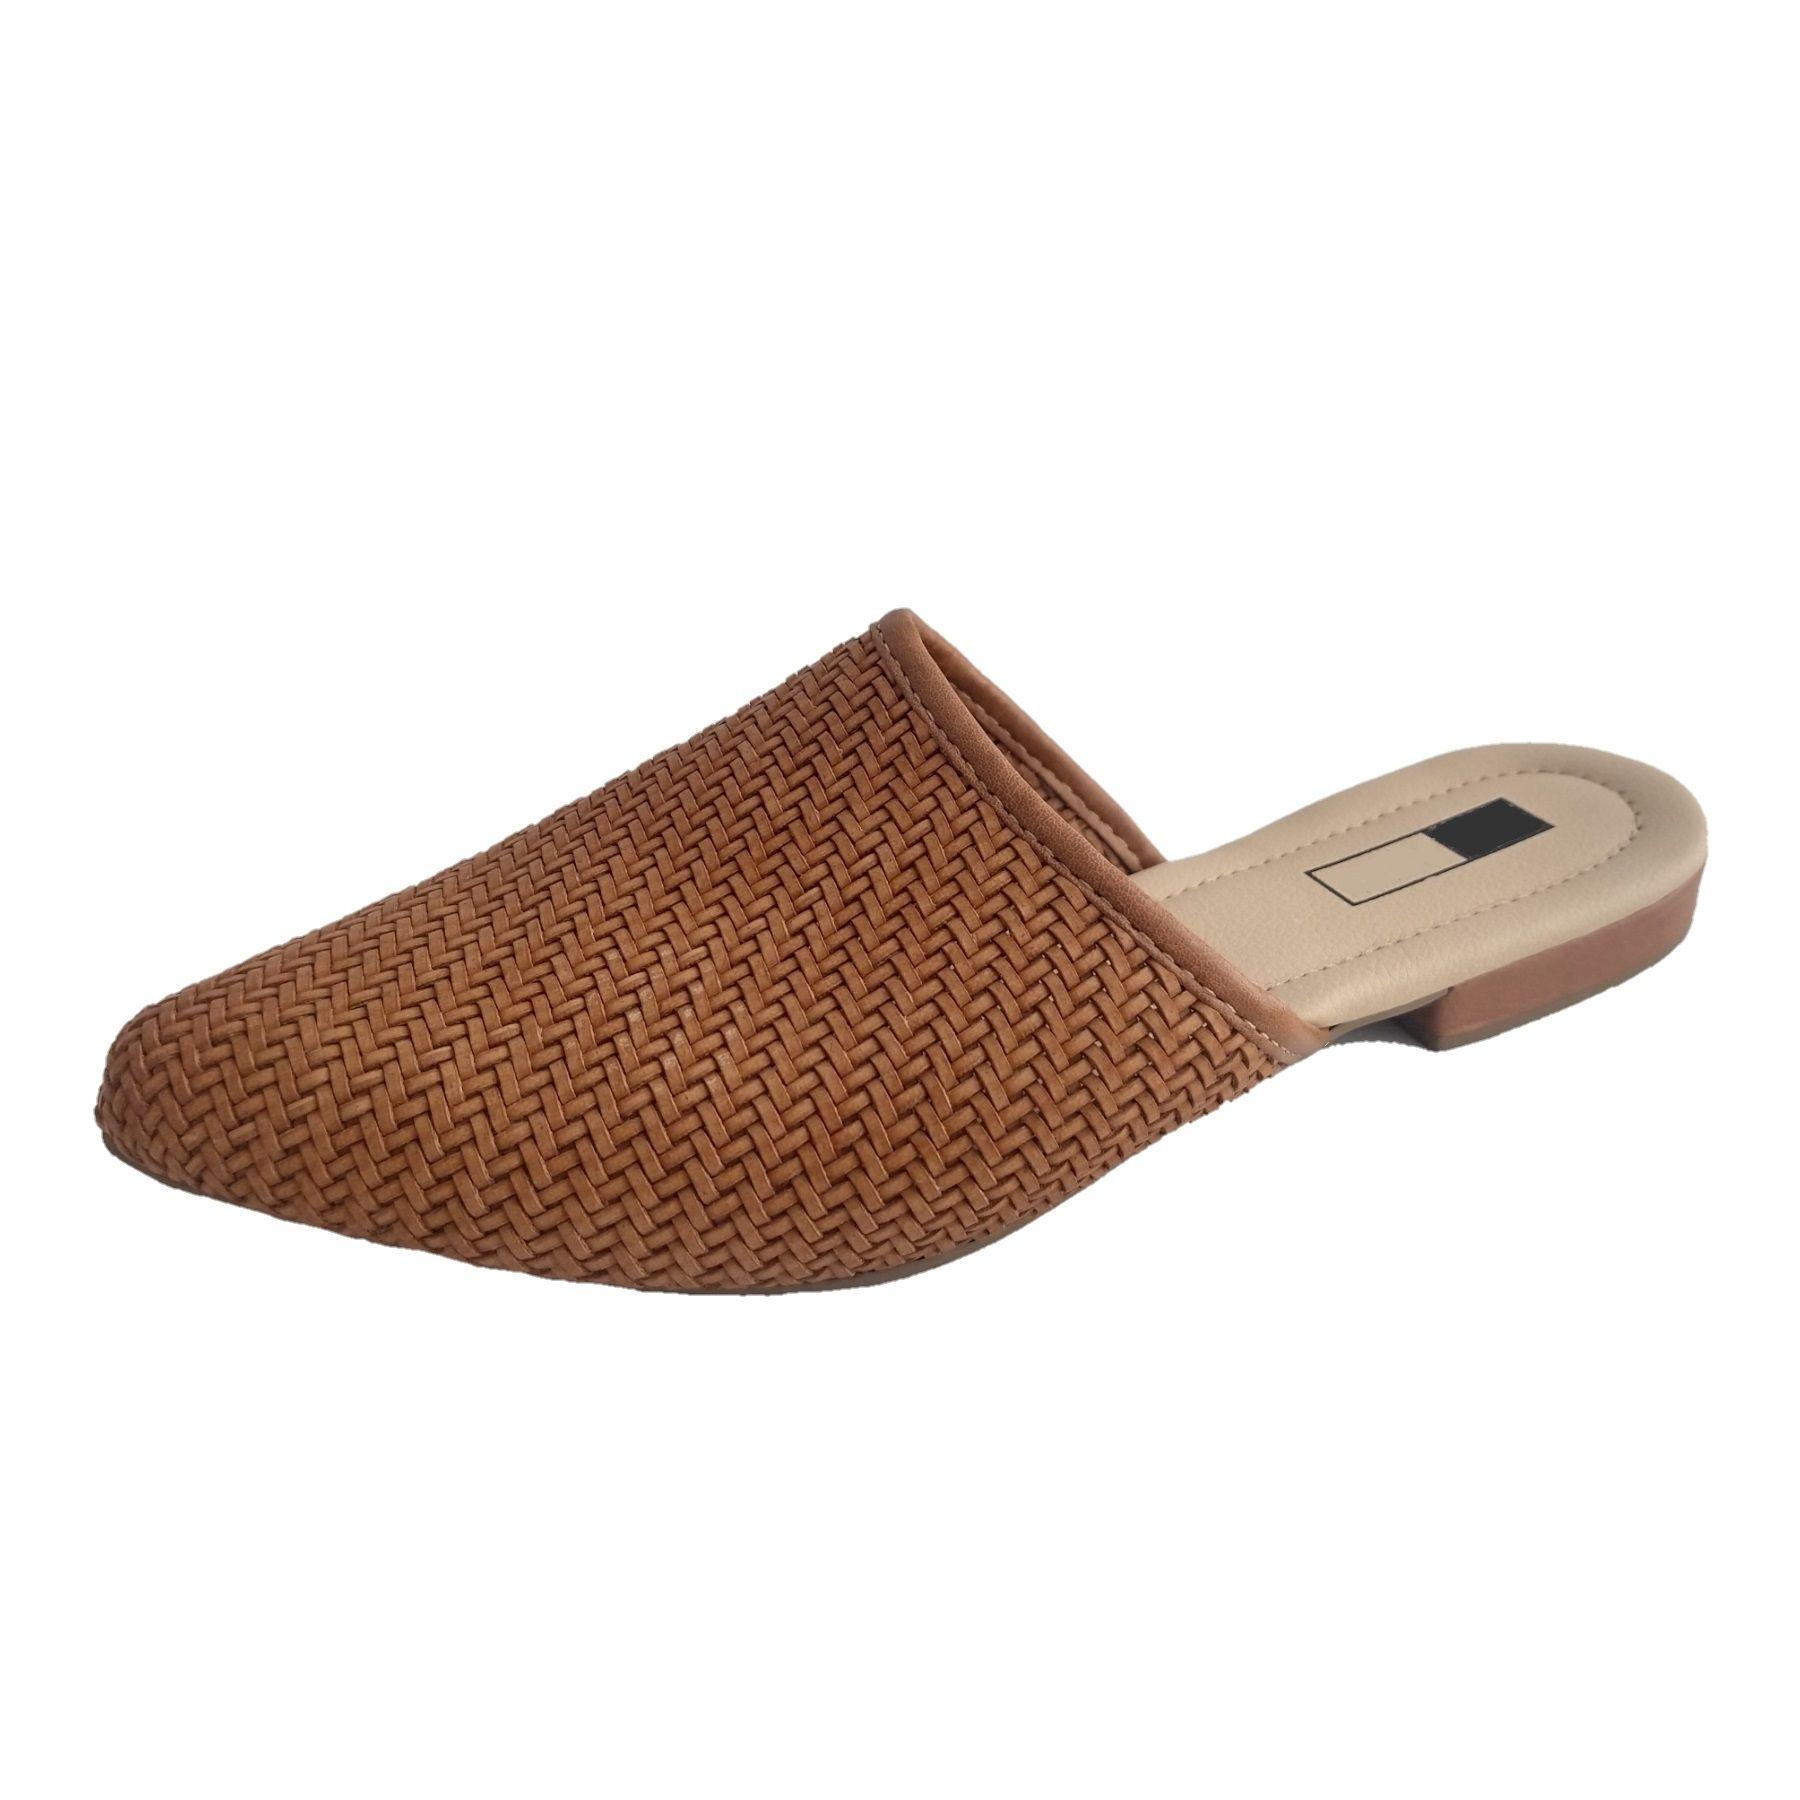 Mule Slipper SapatoWeb Tranças Caramelo  - SAPATOWEB.COM